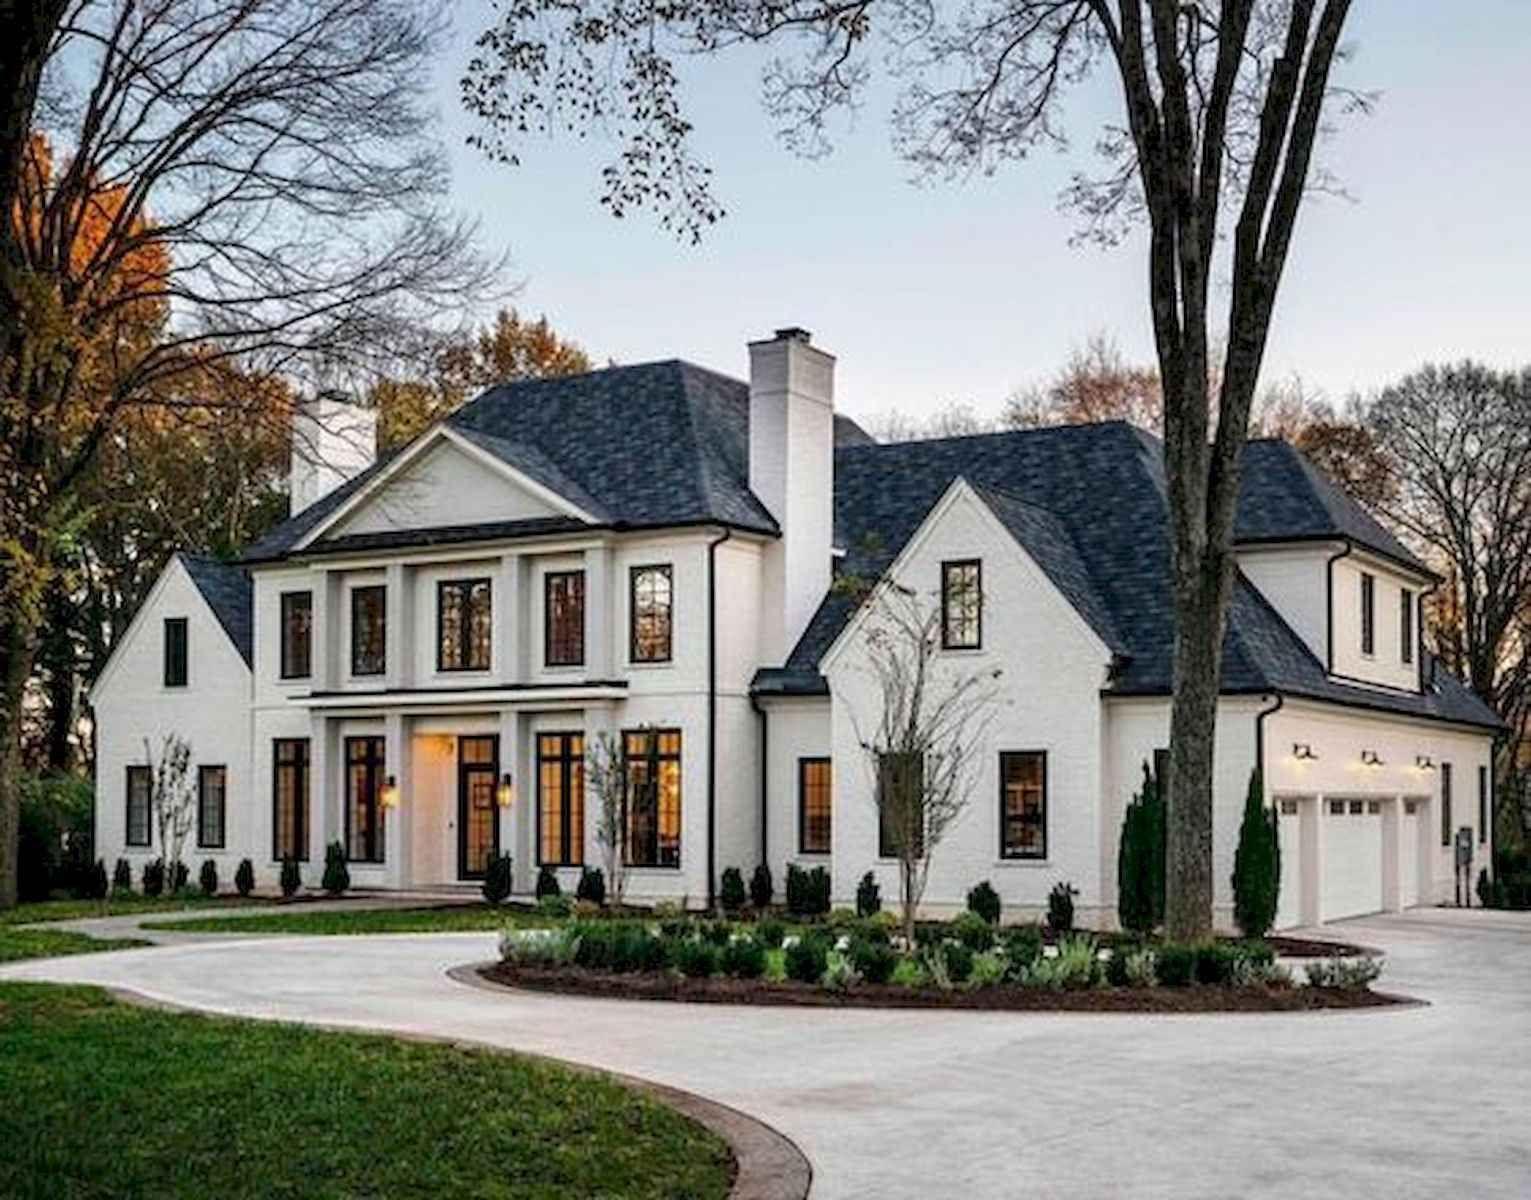 40 Stunning Mansions Luxury Exterior Design Ideas 26 House Designs Exterior Dream House Exterior House Exterior